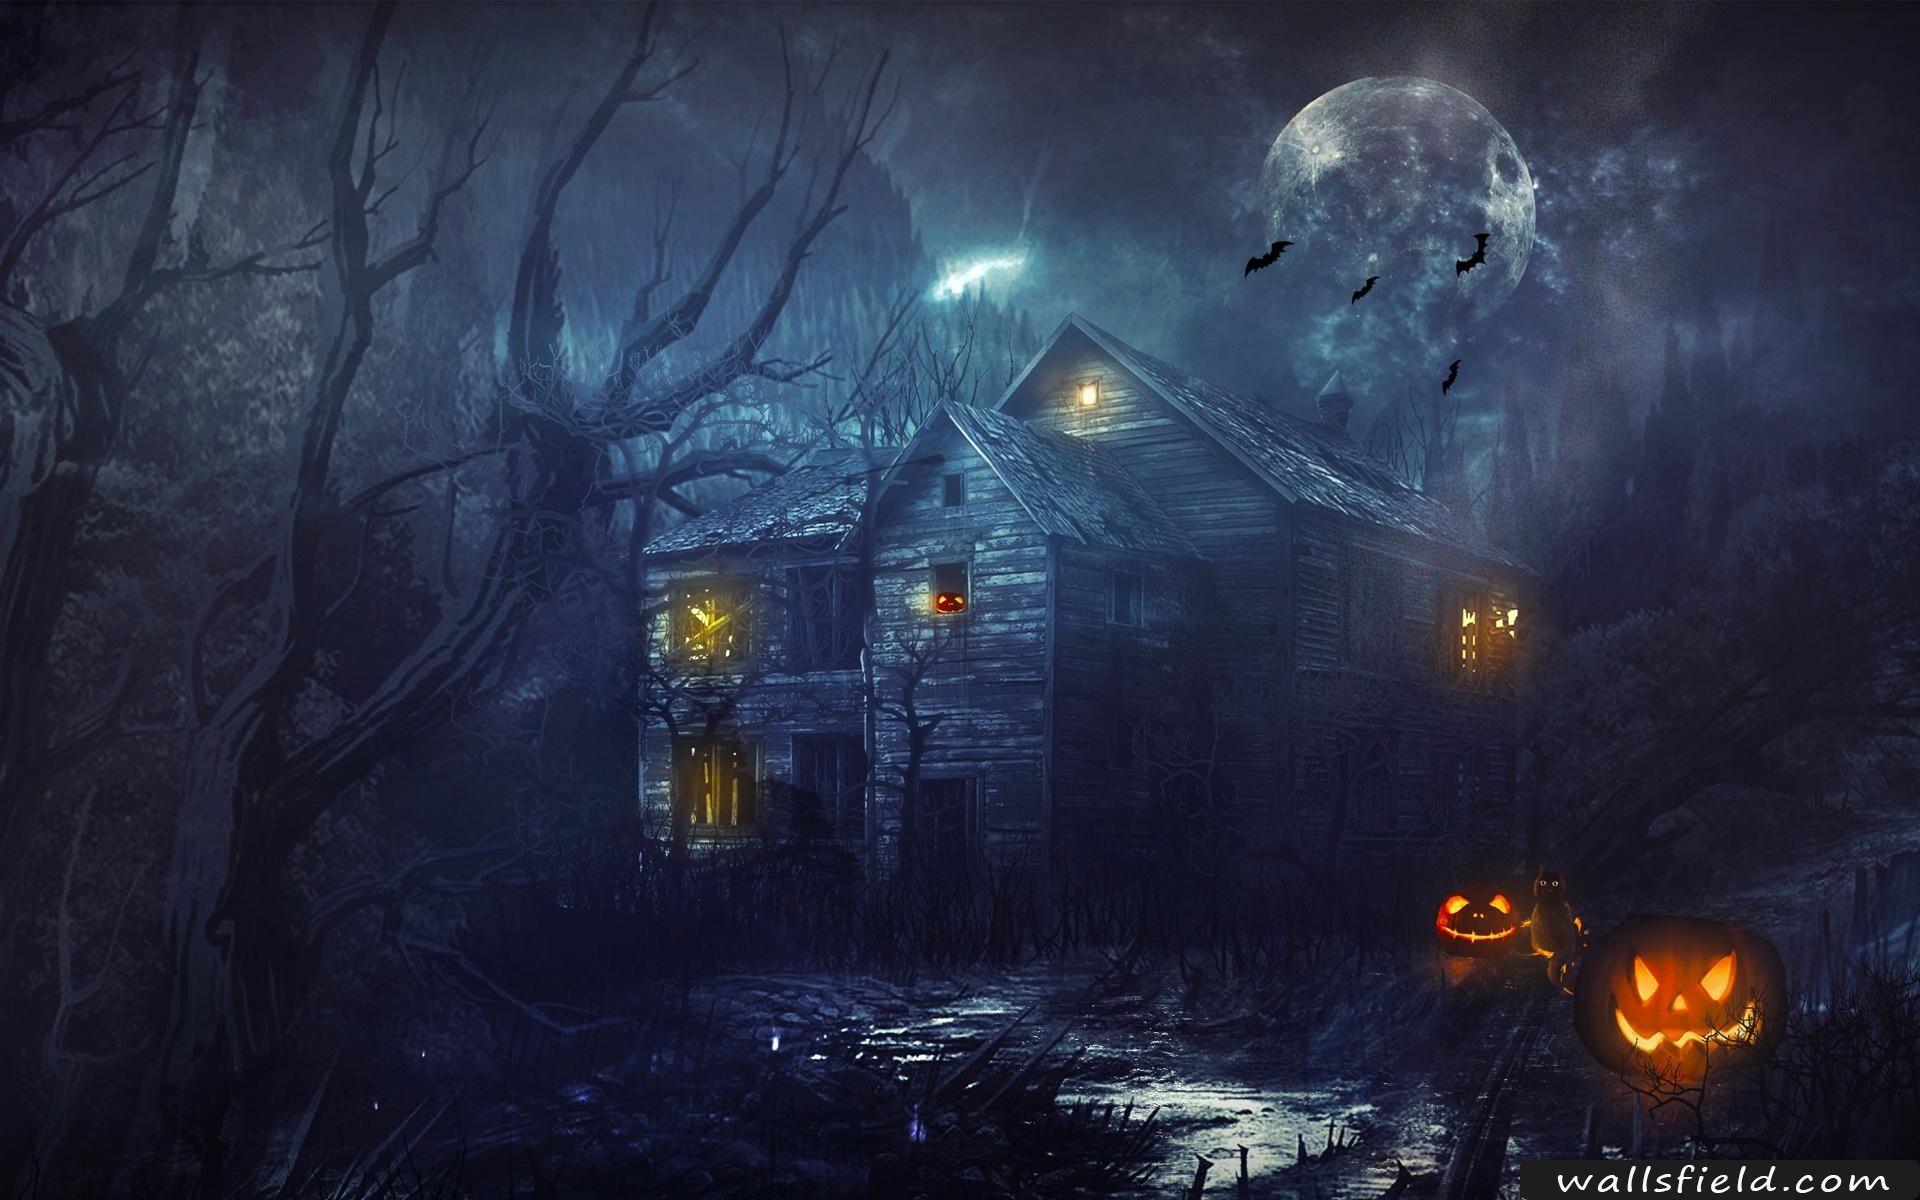 Download Wallpaper High Quality Halloween - 5aa96679fd344867dcfa84510f77398c  Snapshot_468294.jpg